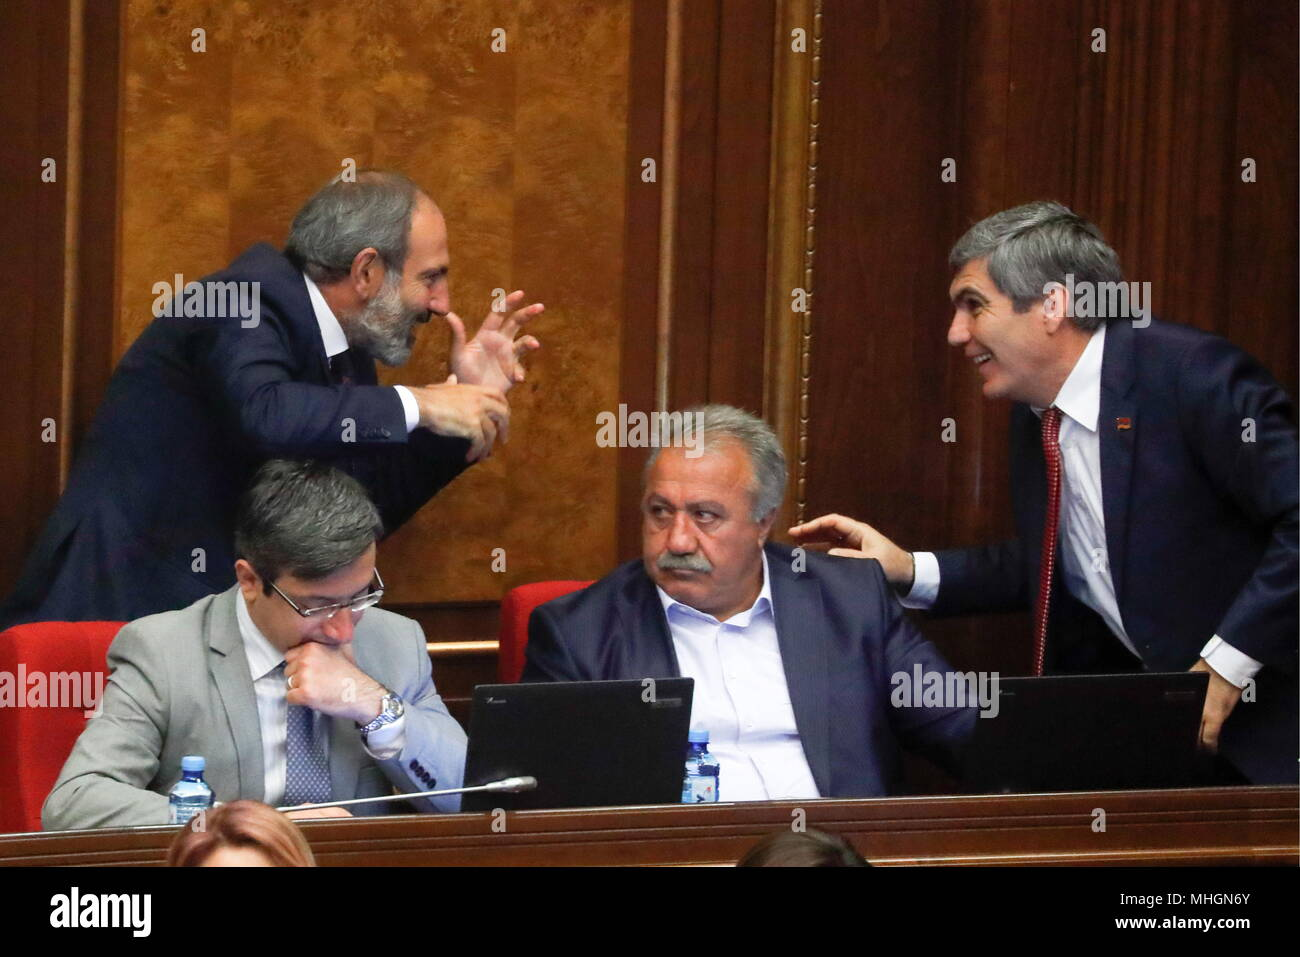 armenian parliament 2018 pashinyan ile ilgili görsel sonucu